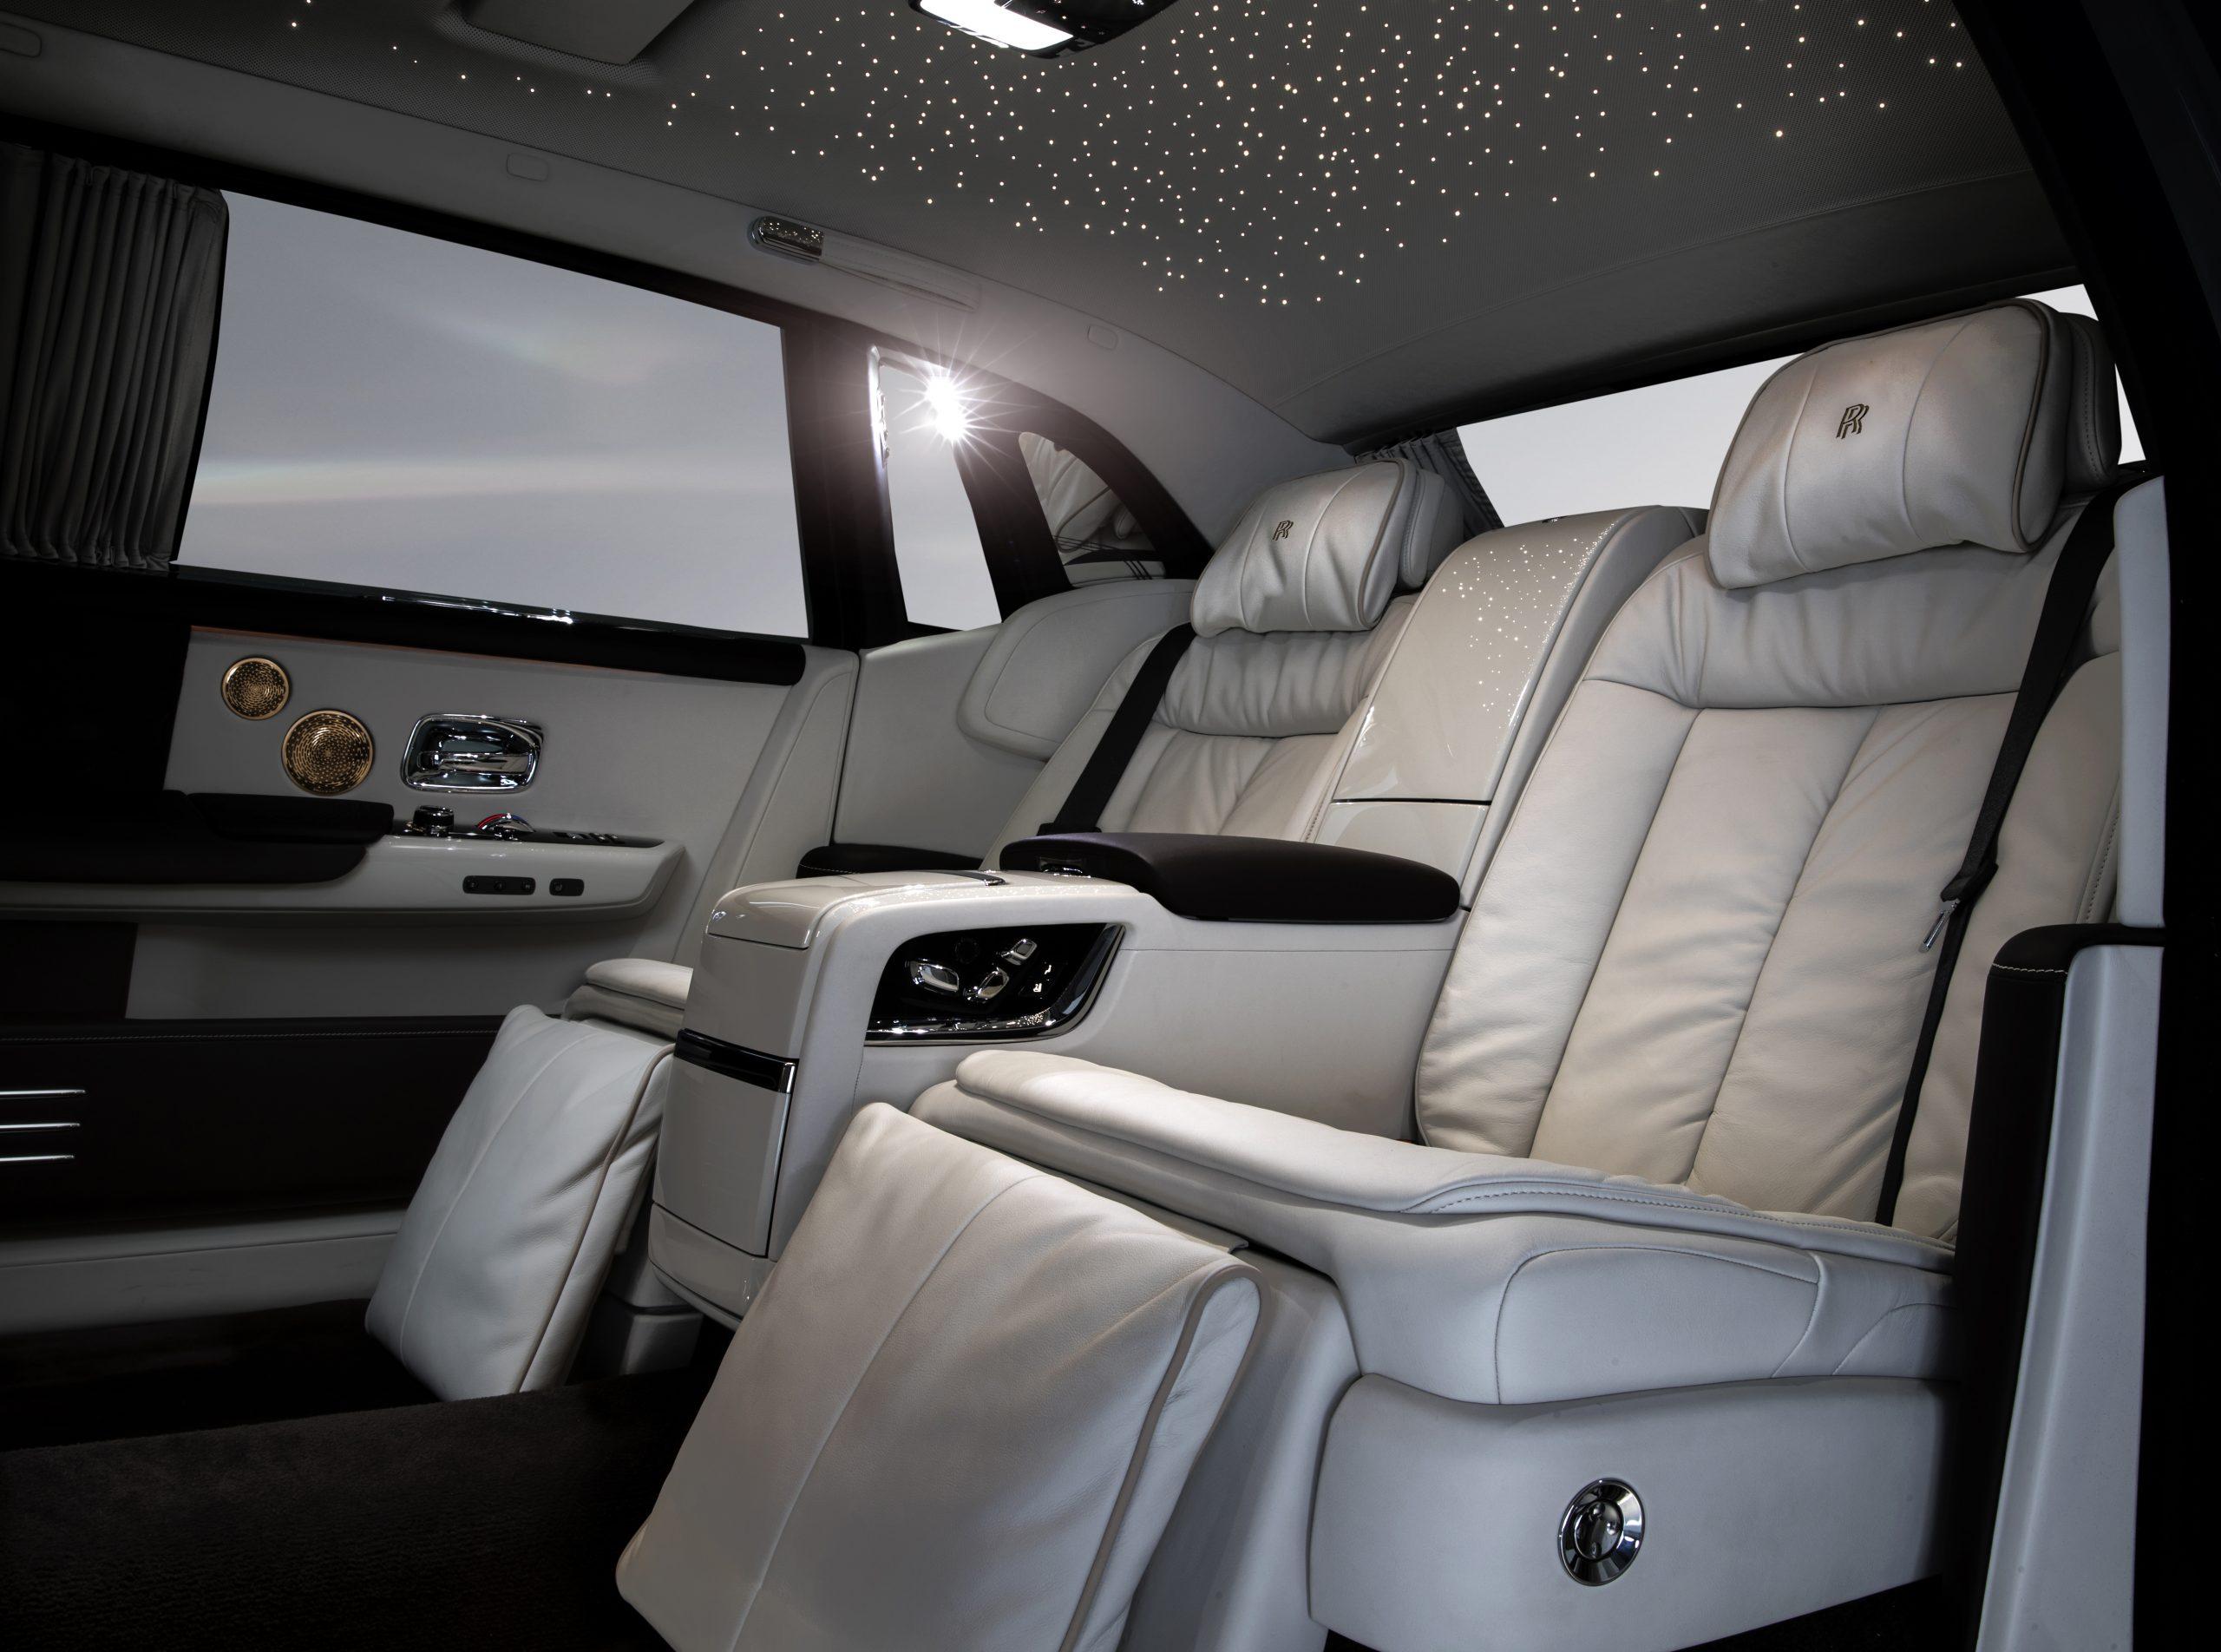 Rolls-Royce Phantom interior with stars